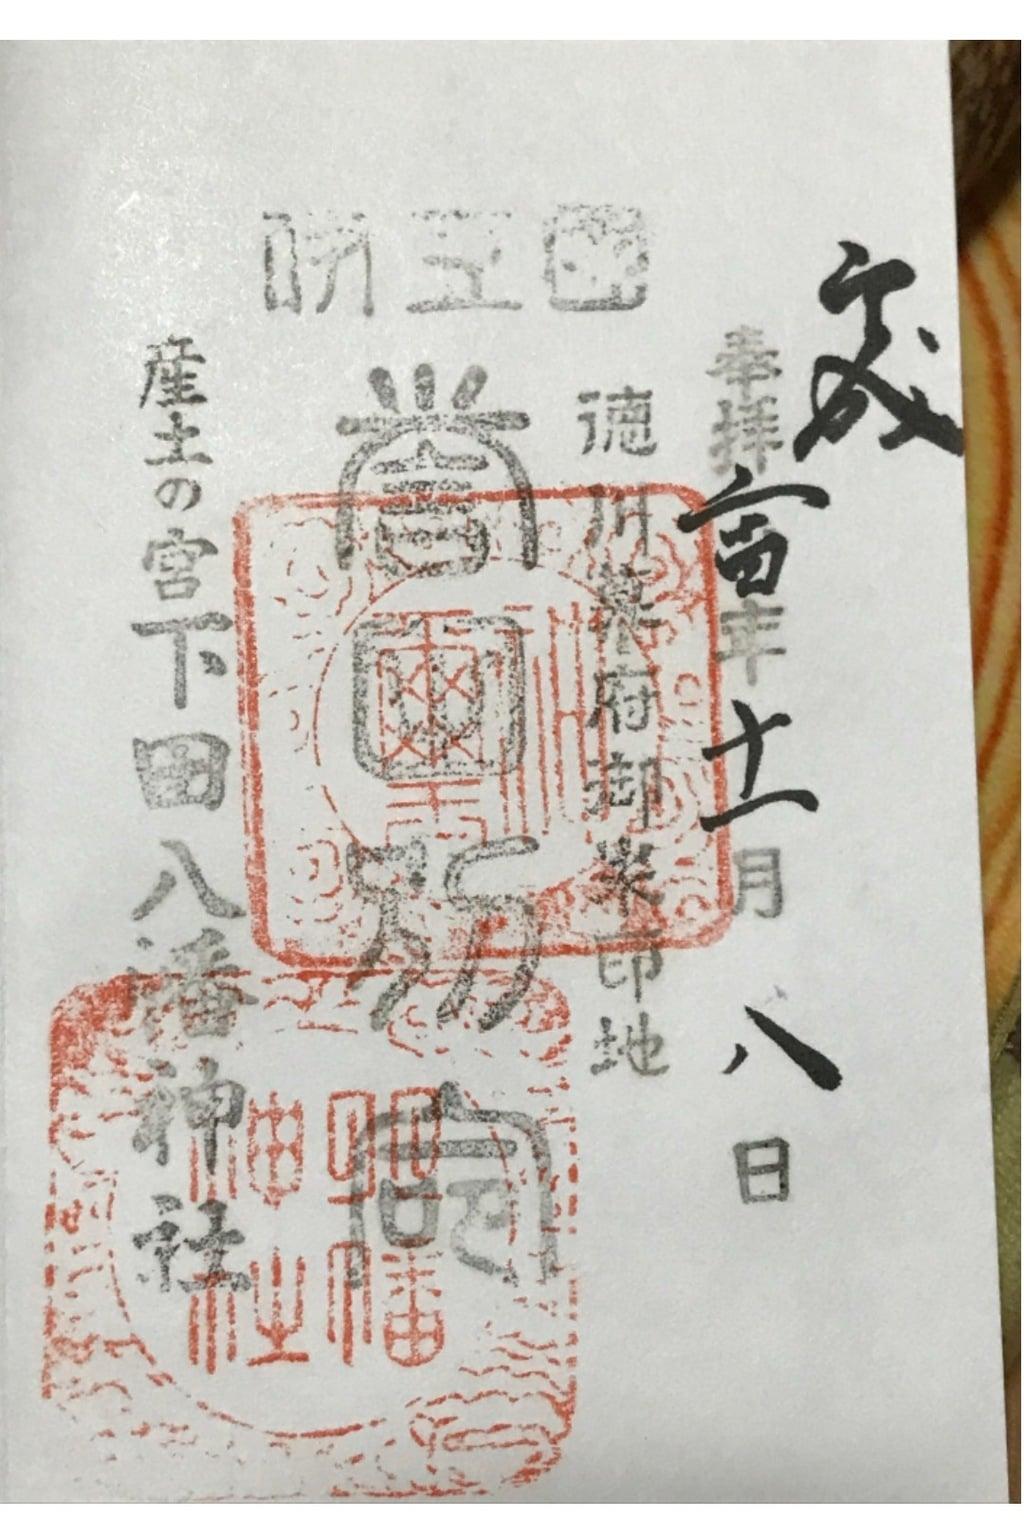 下田八幡神社の御朱印